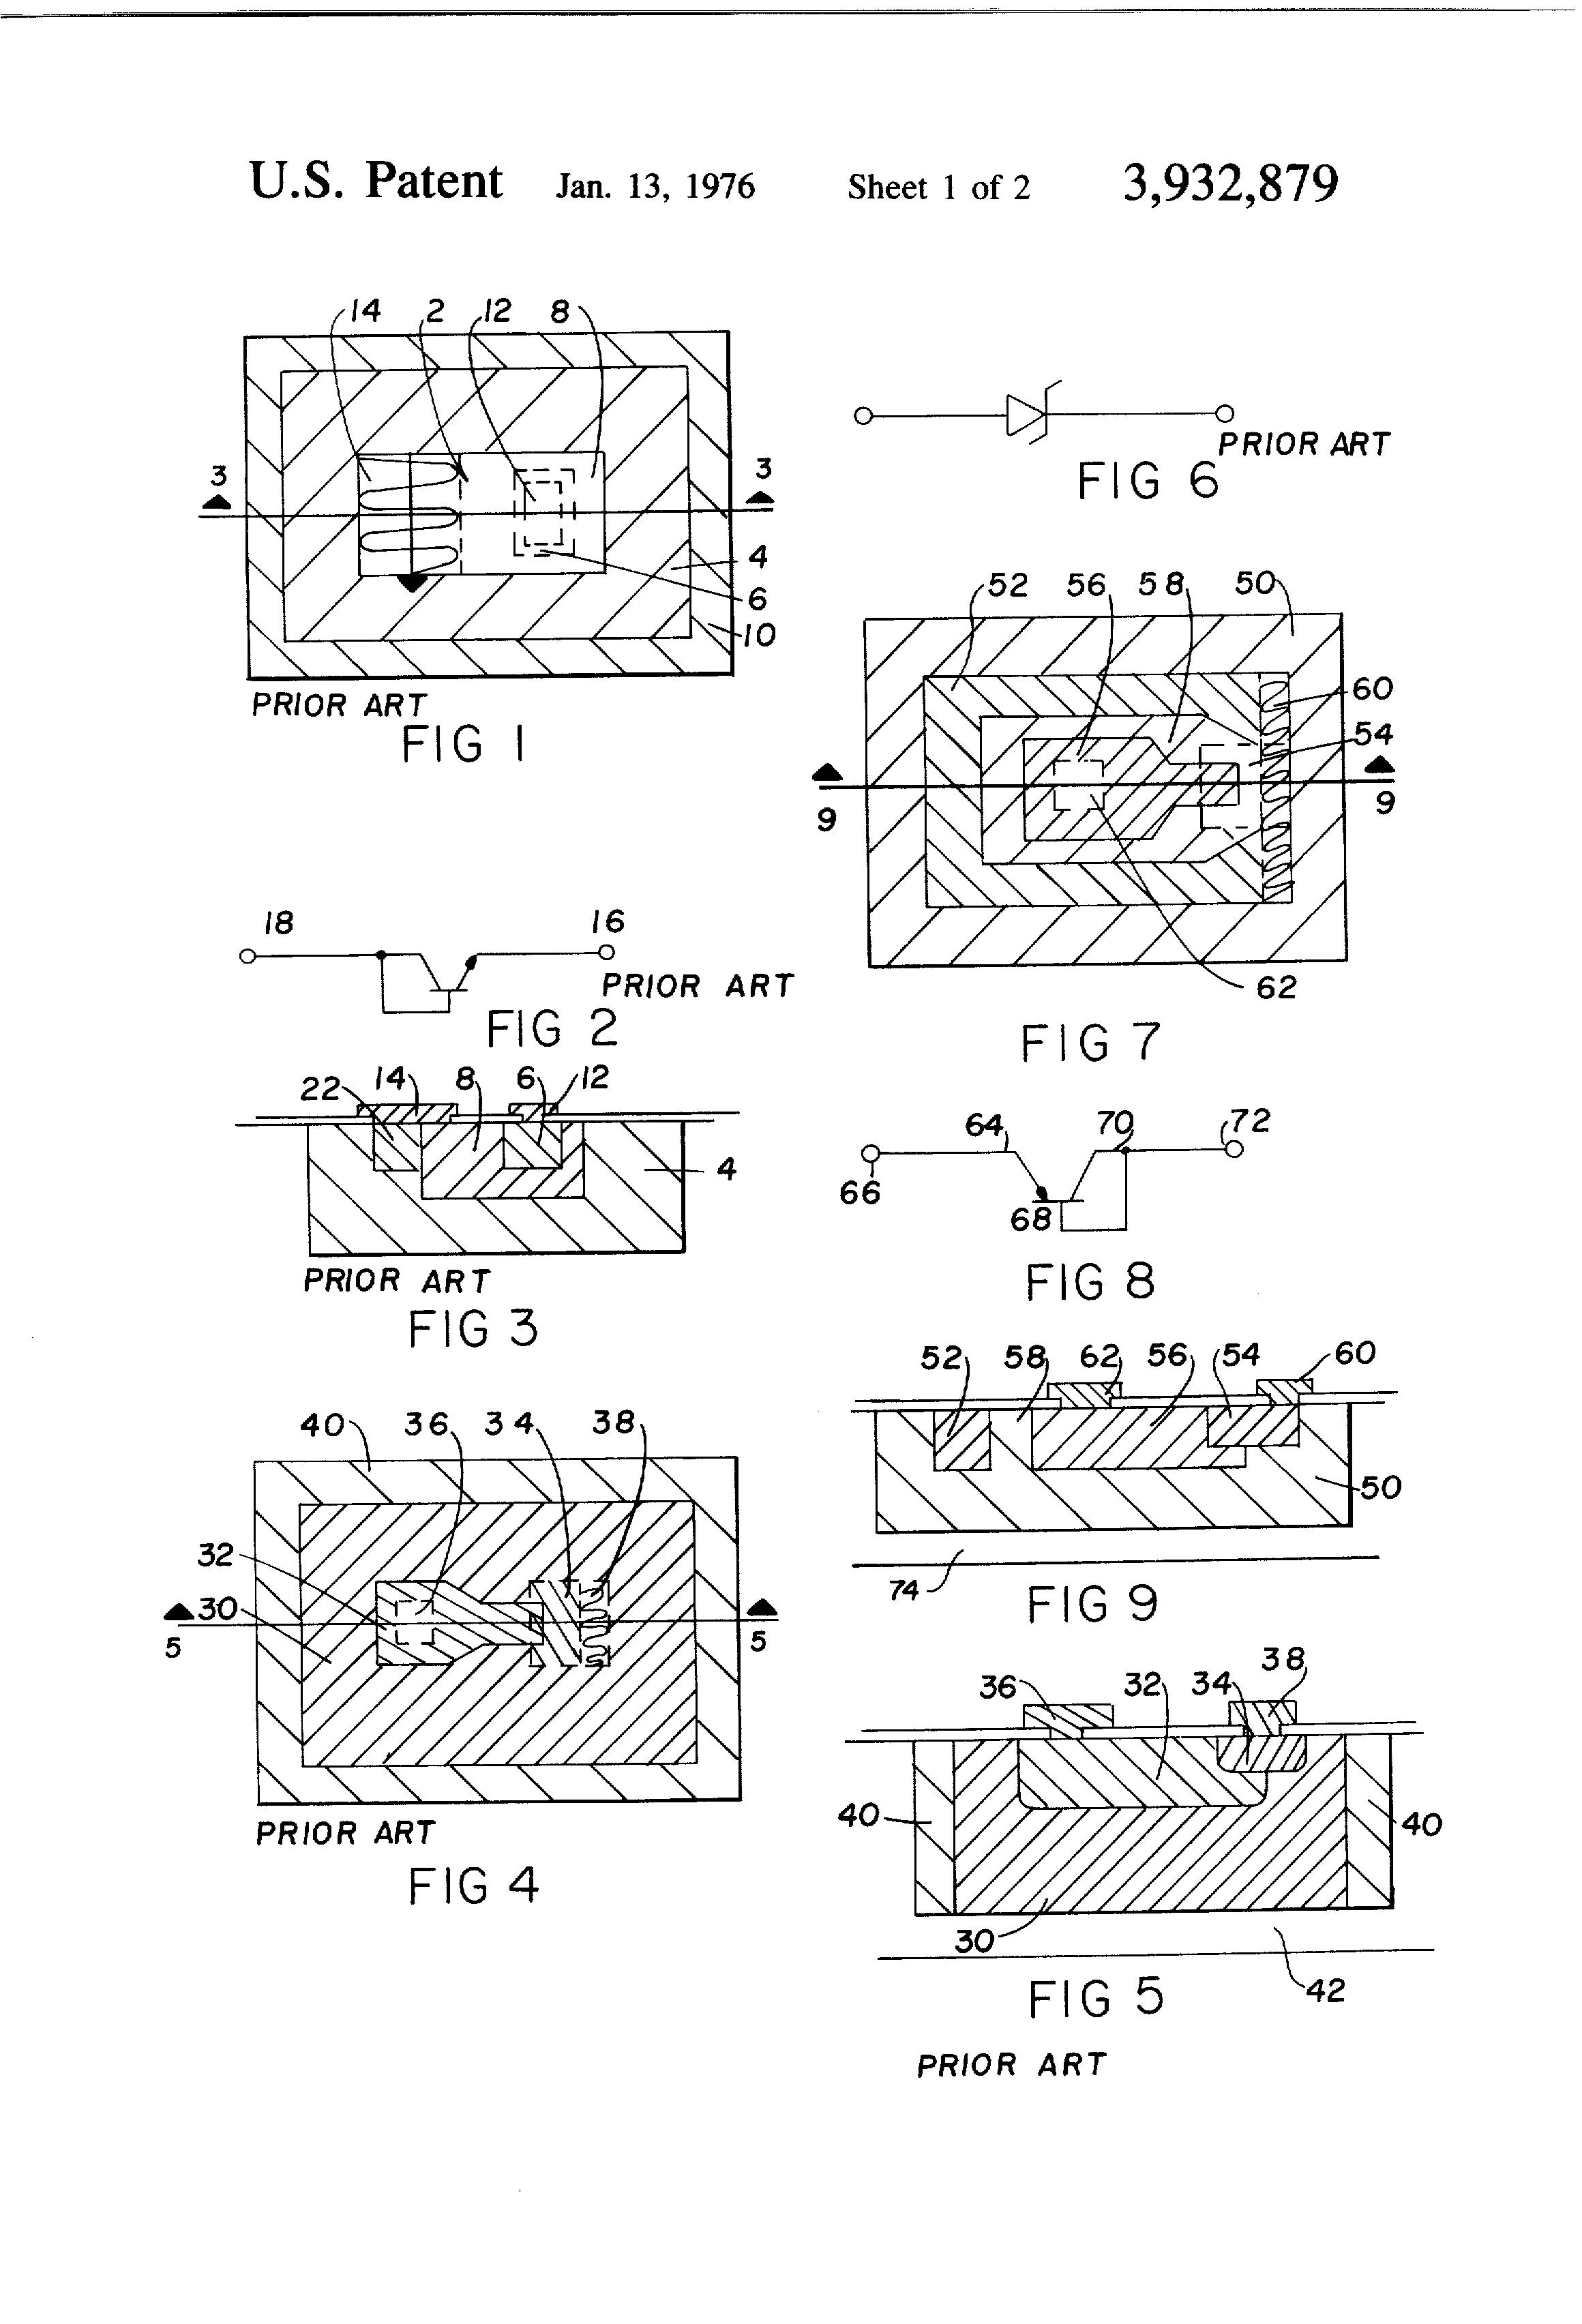 Brevet Us3932879 Bilaterally Conducting Zener Diode And Circuit Diagram Characteristics Patent Drawing